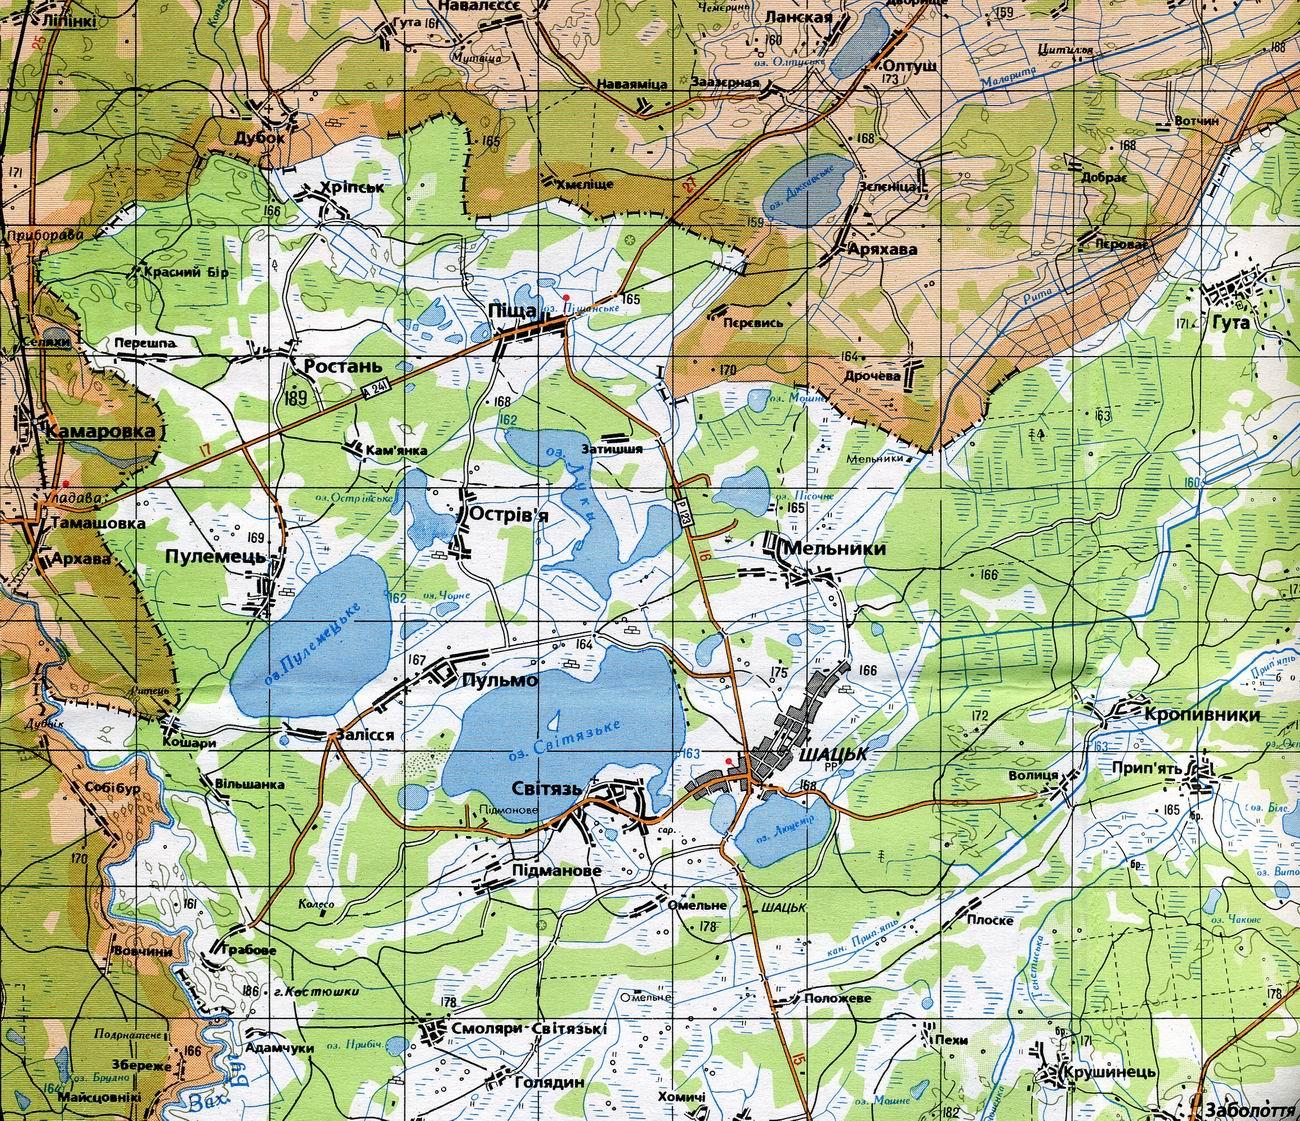 Шацкие озера 25.06 - 28.06 Lakes_1